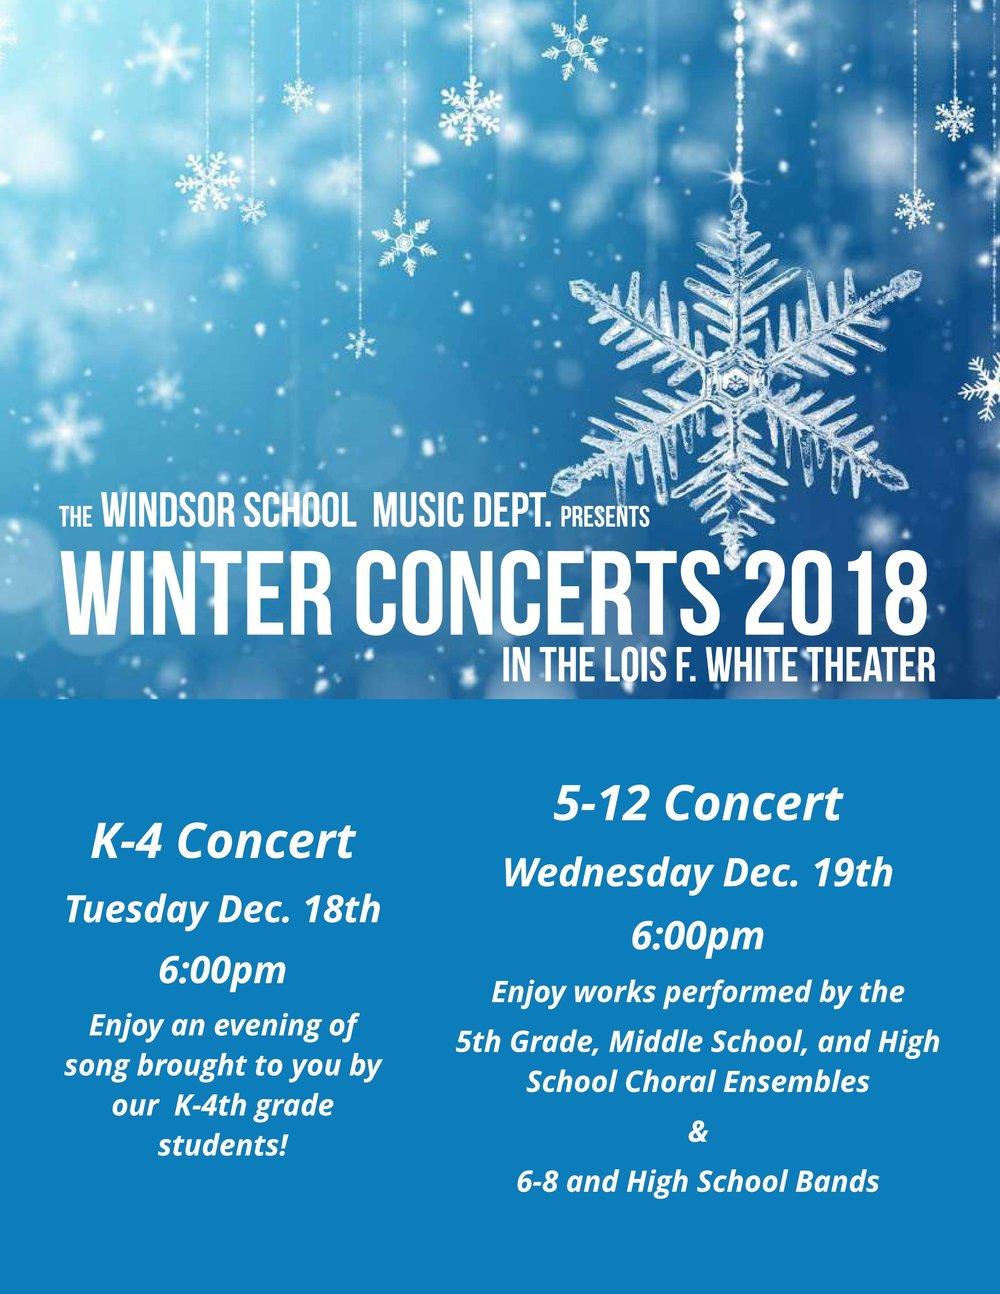 2018 Concert Poster.jpg